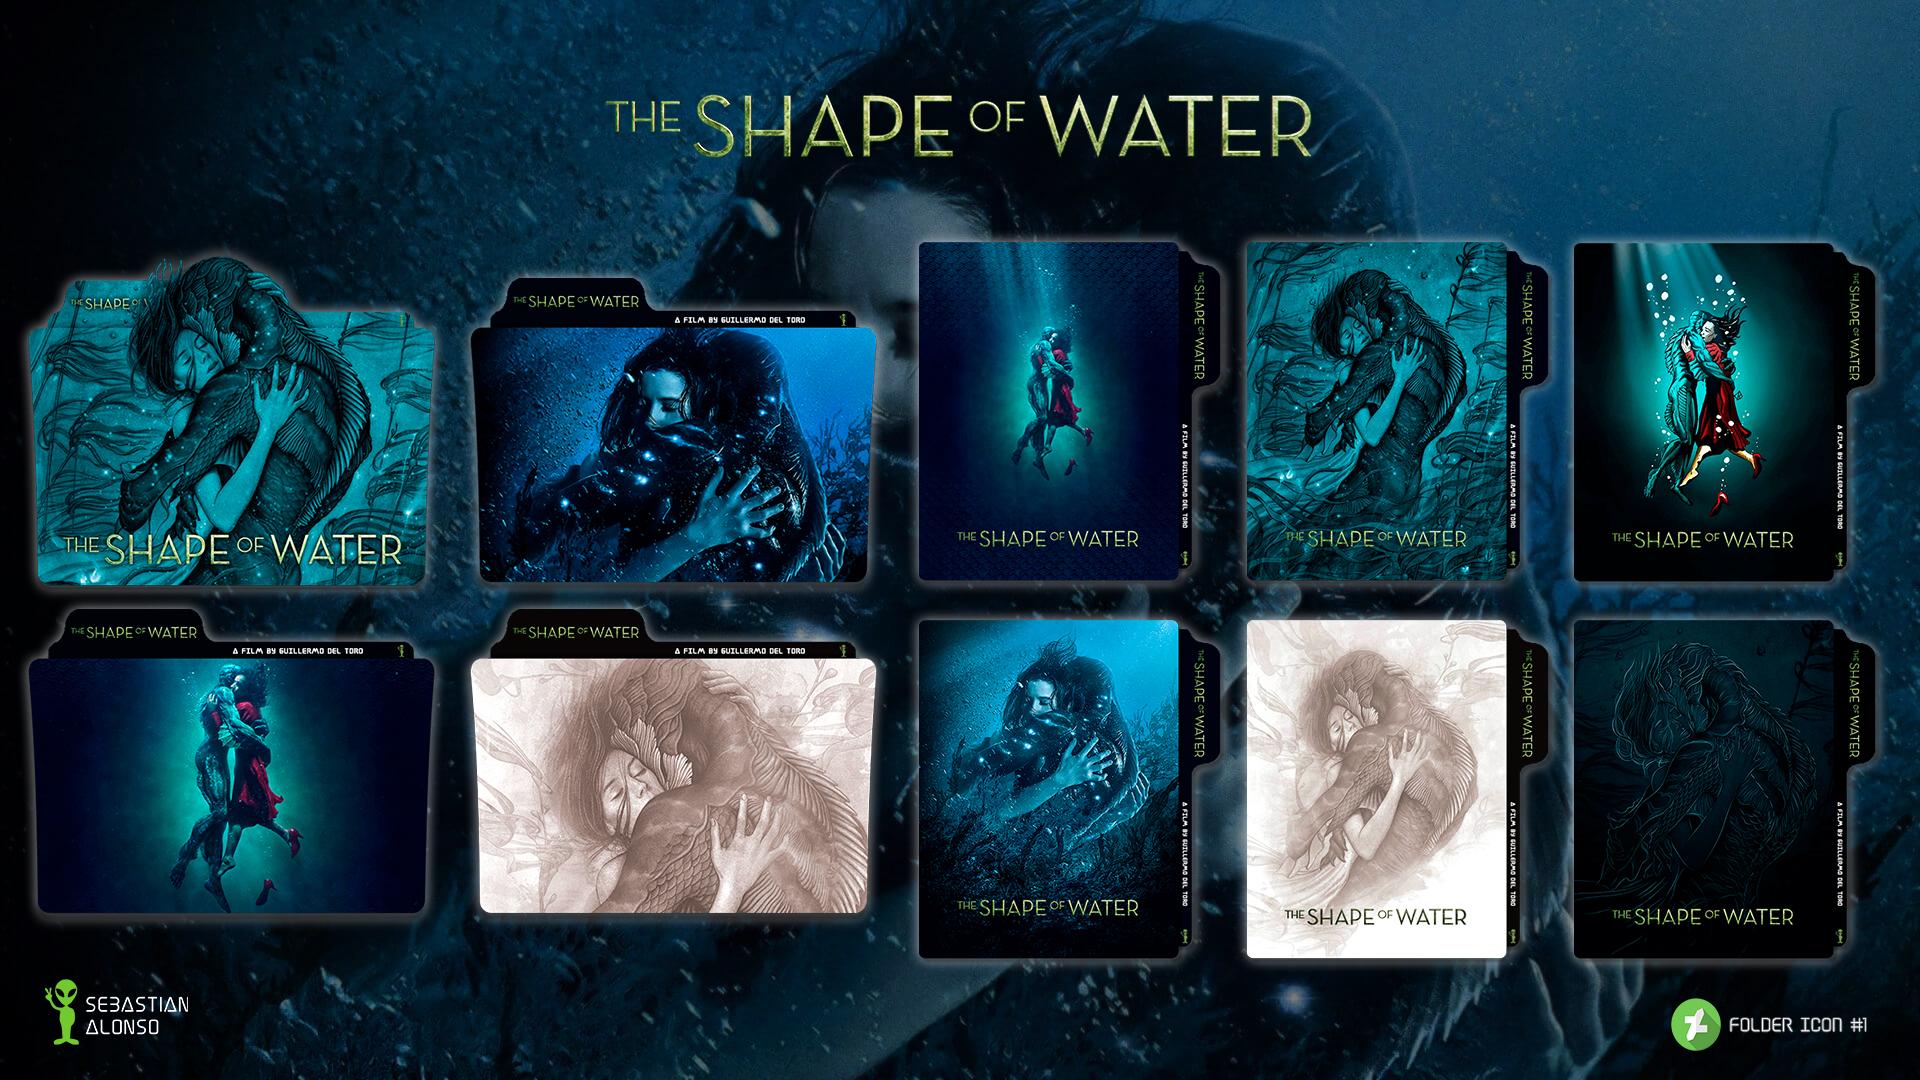 The Shape Of Water 2017 Folder Icon 1 By Sebasmgsse On Deviantart